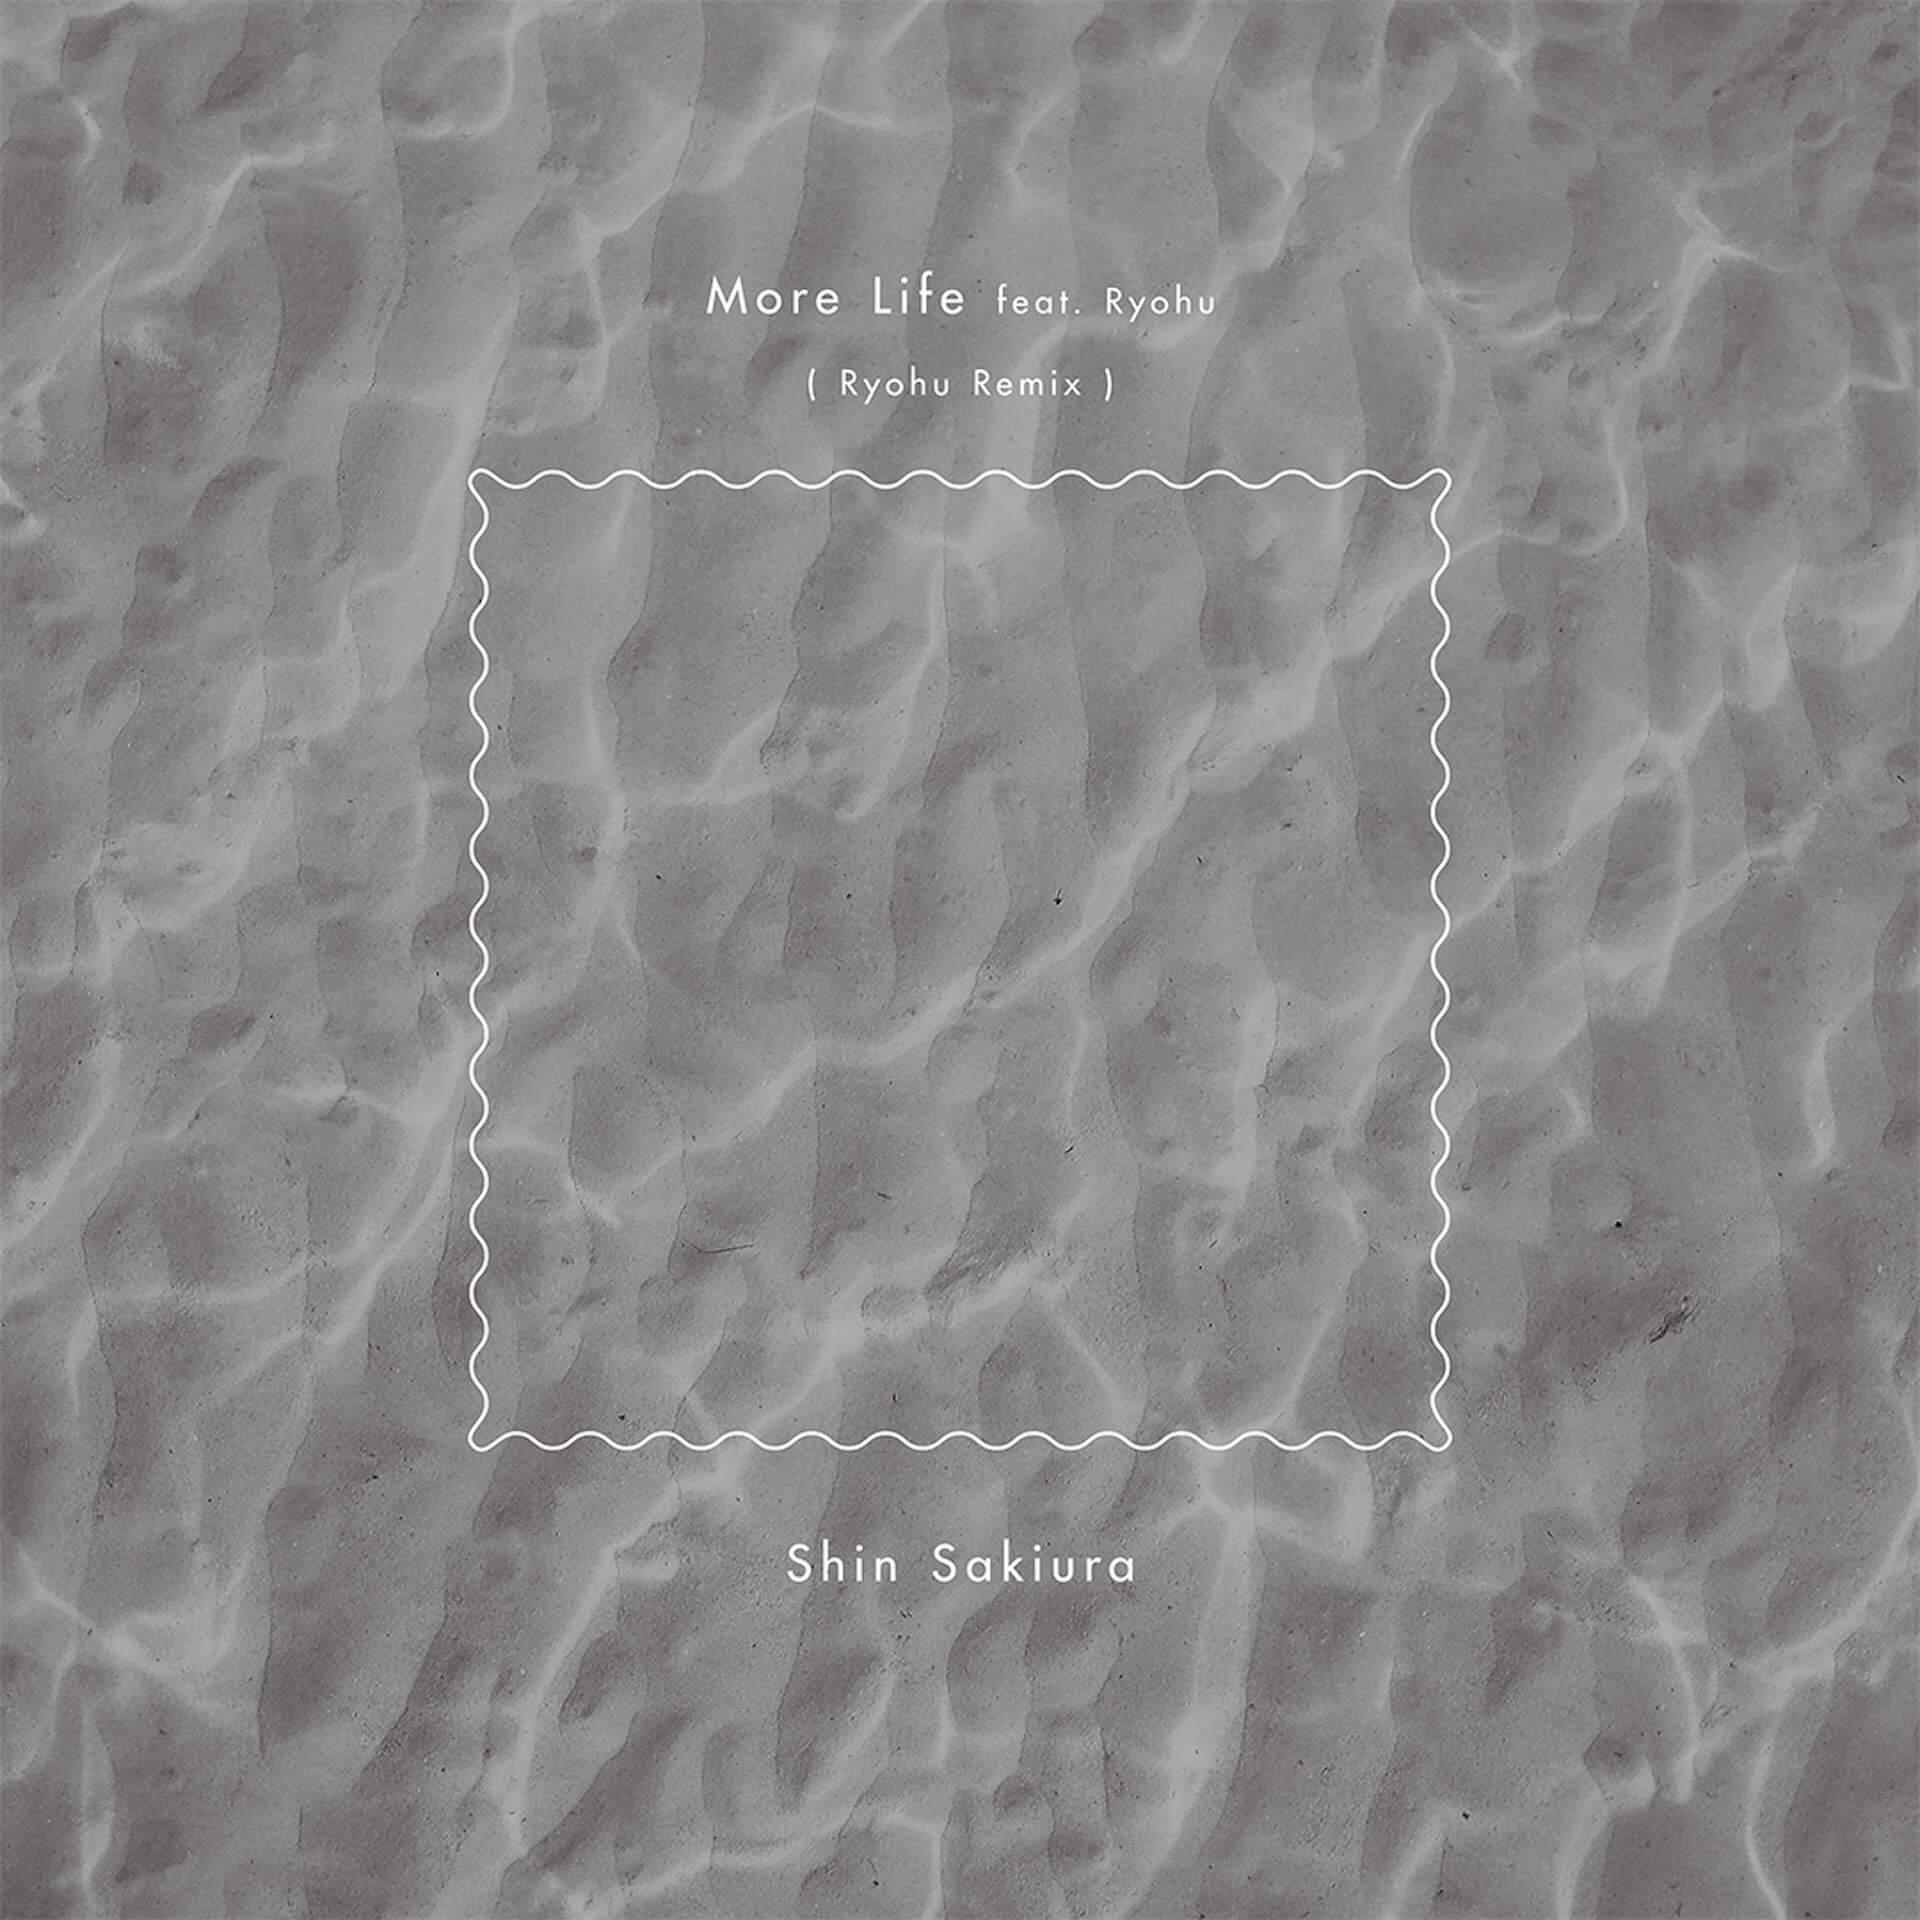 "Shin SakiuraがKANDYTOWNのRyohuを迎えた""More Life""の7インチをリリース!リミックスverもデジタル配信開始 music200701_shinsakiura_ryohu_03"